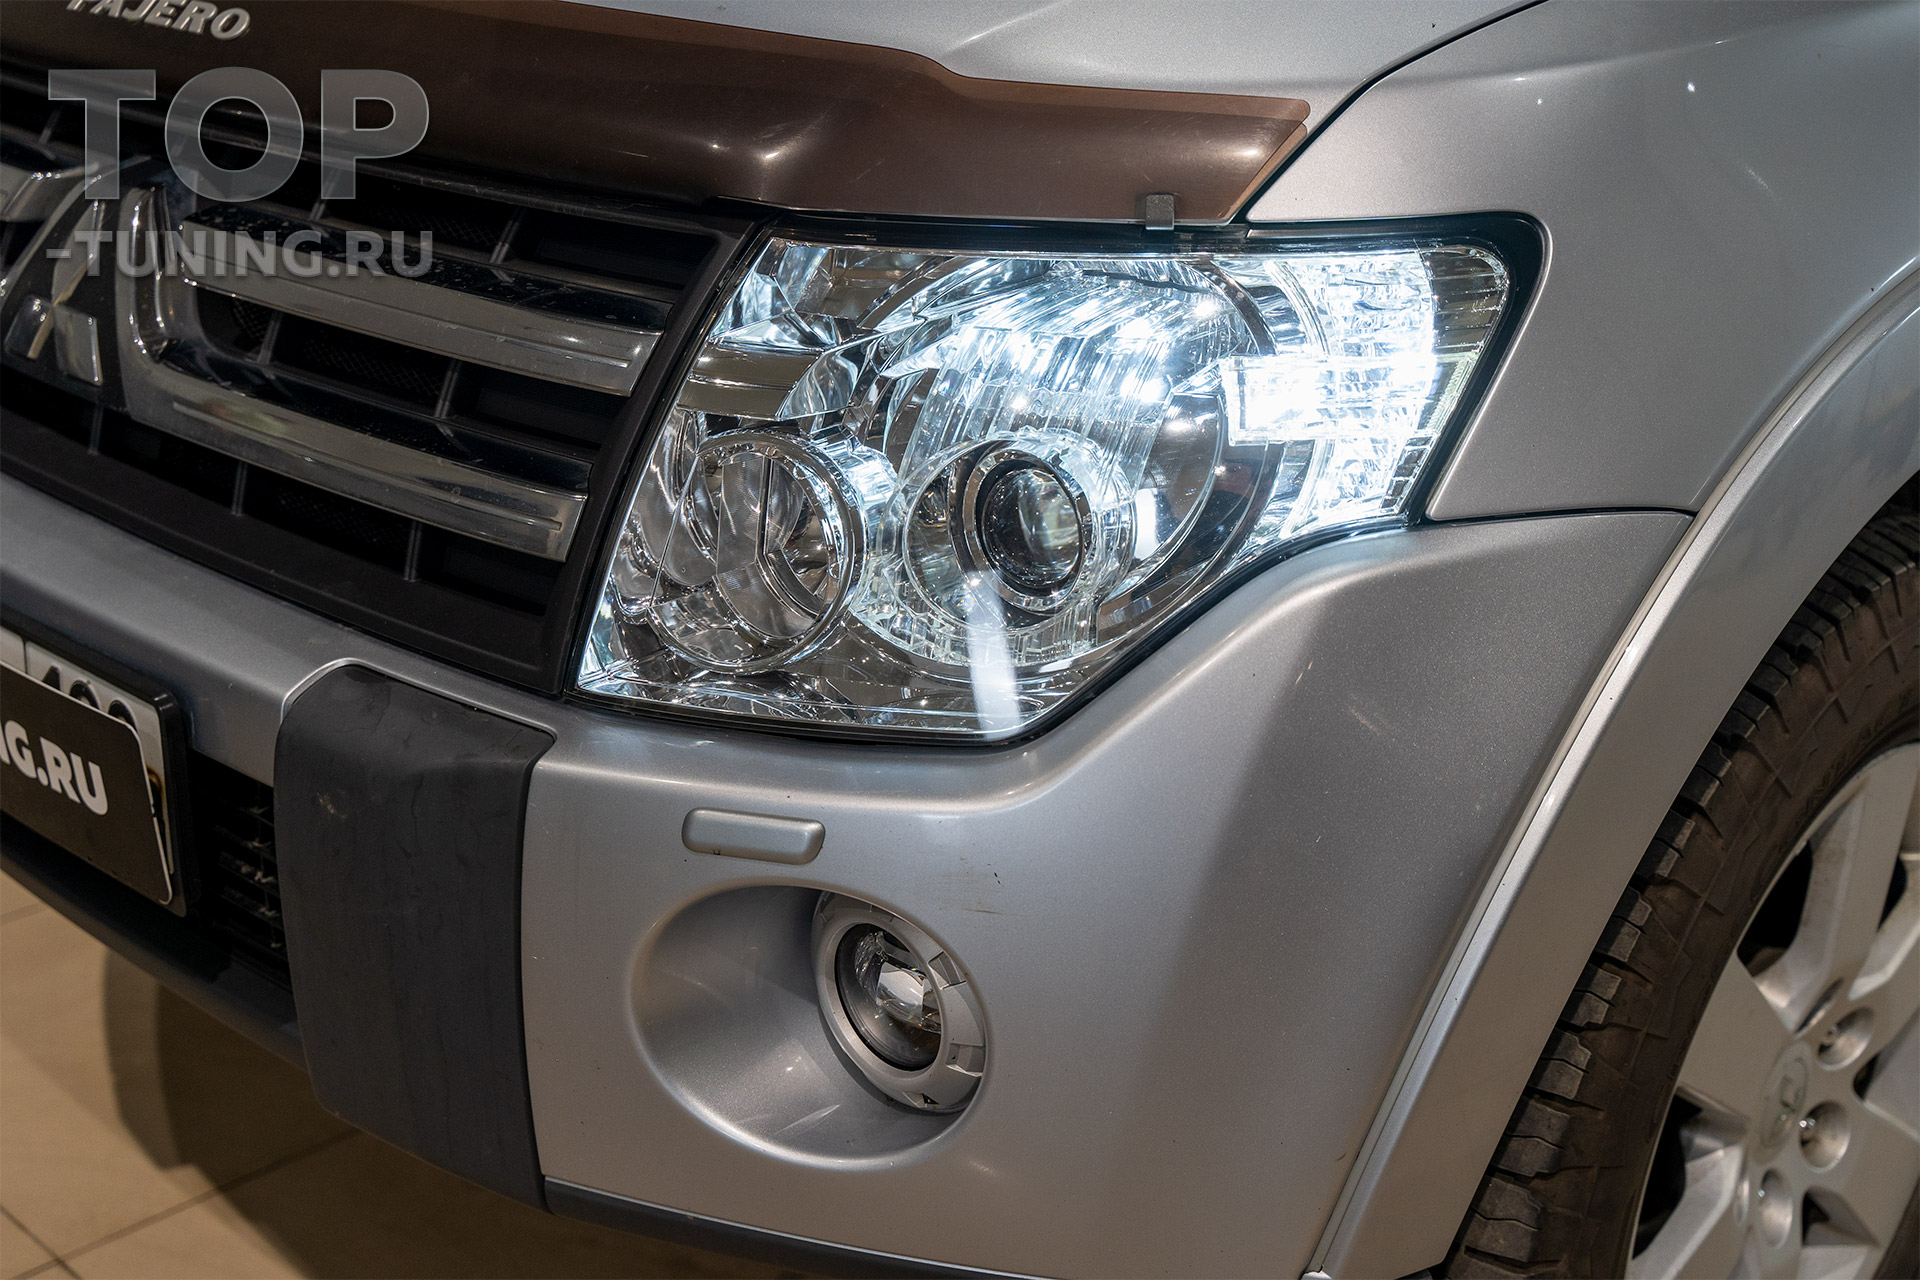 Ходовые огни в фары Mitsubishi Pajero 4